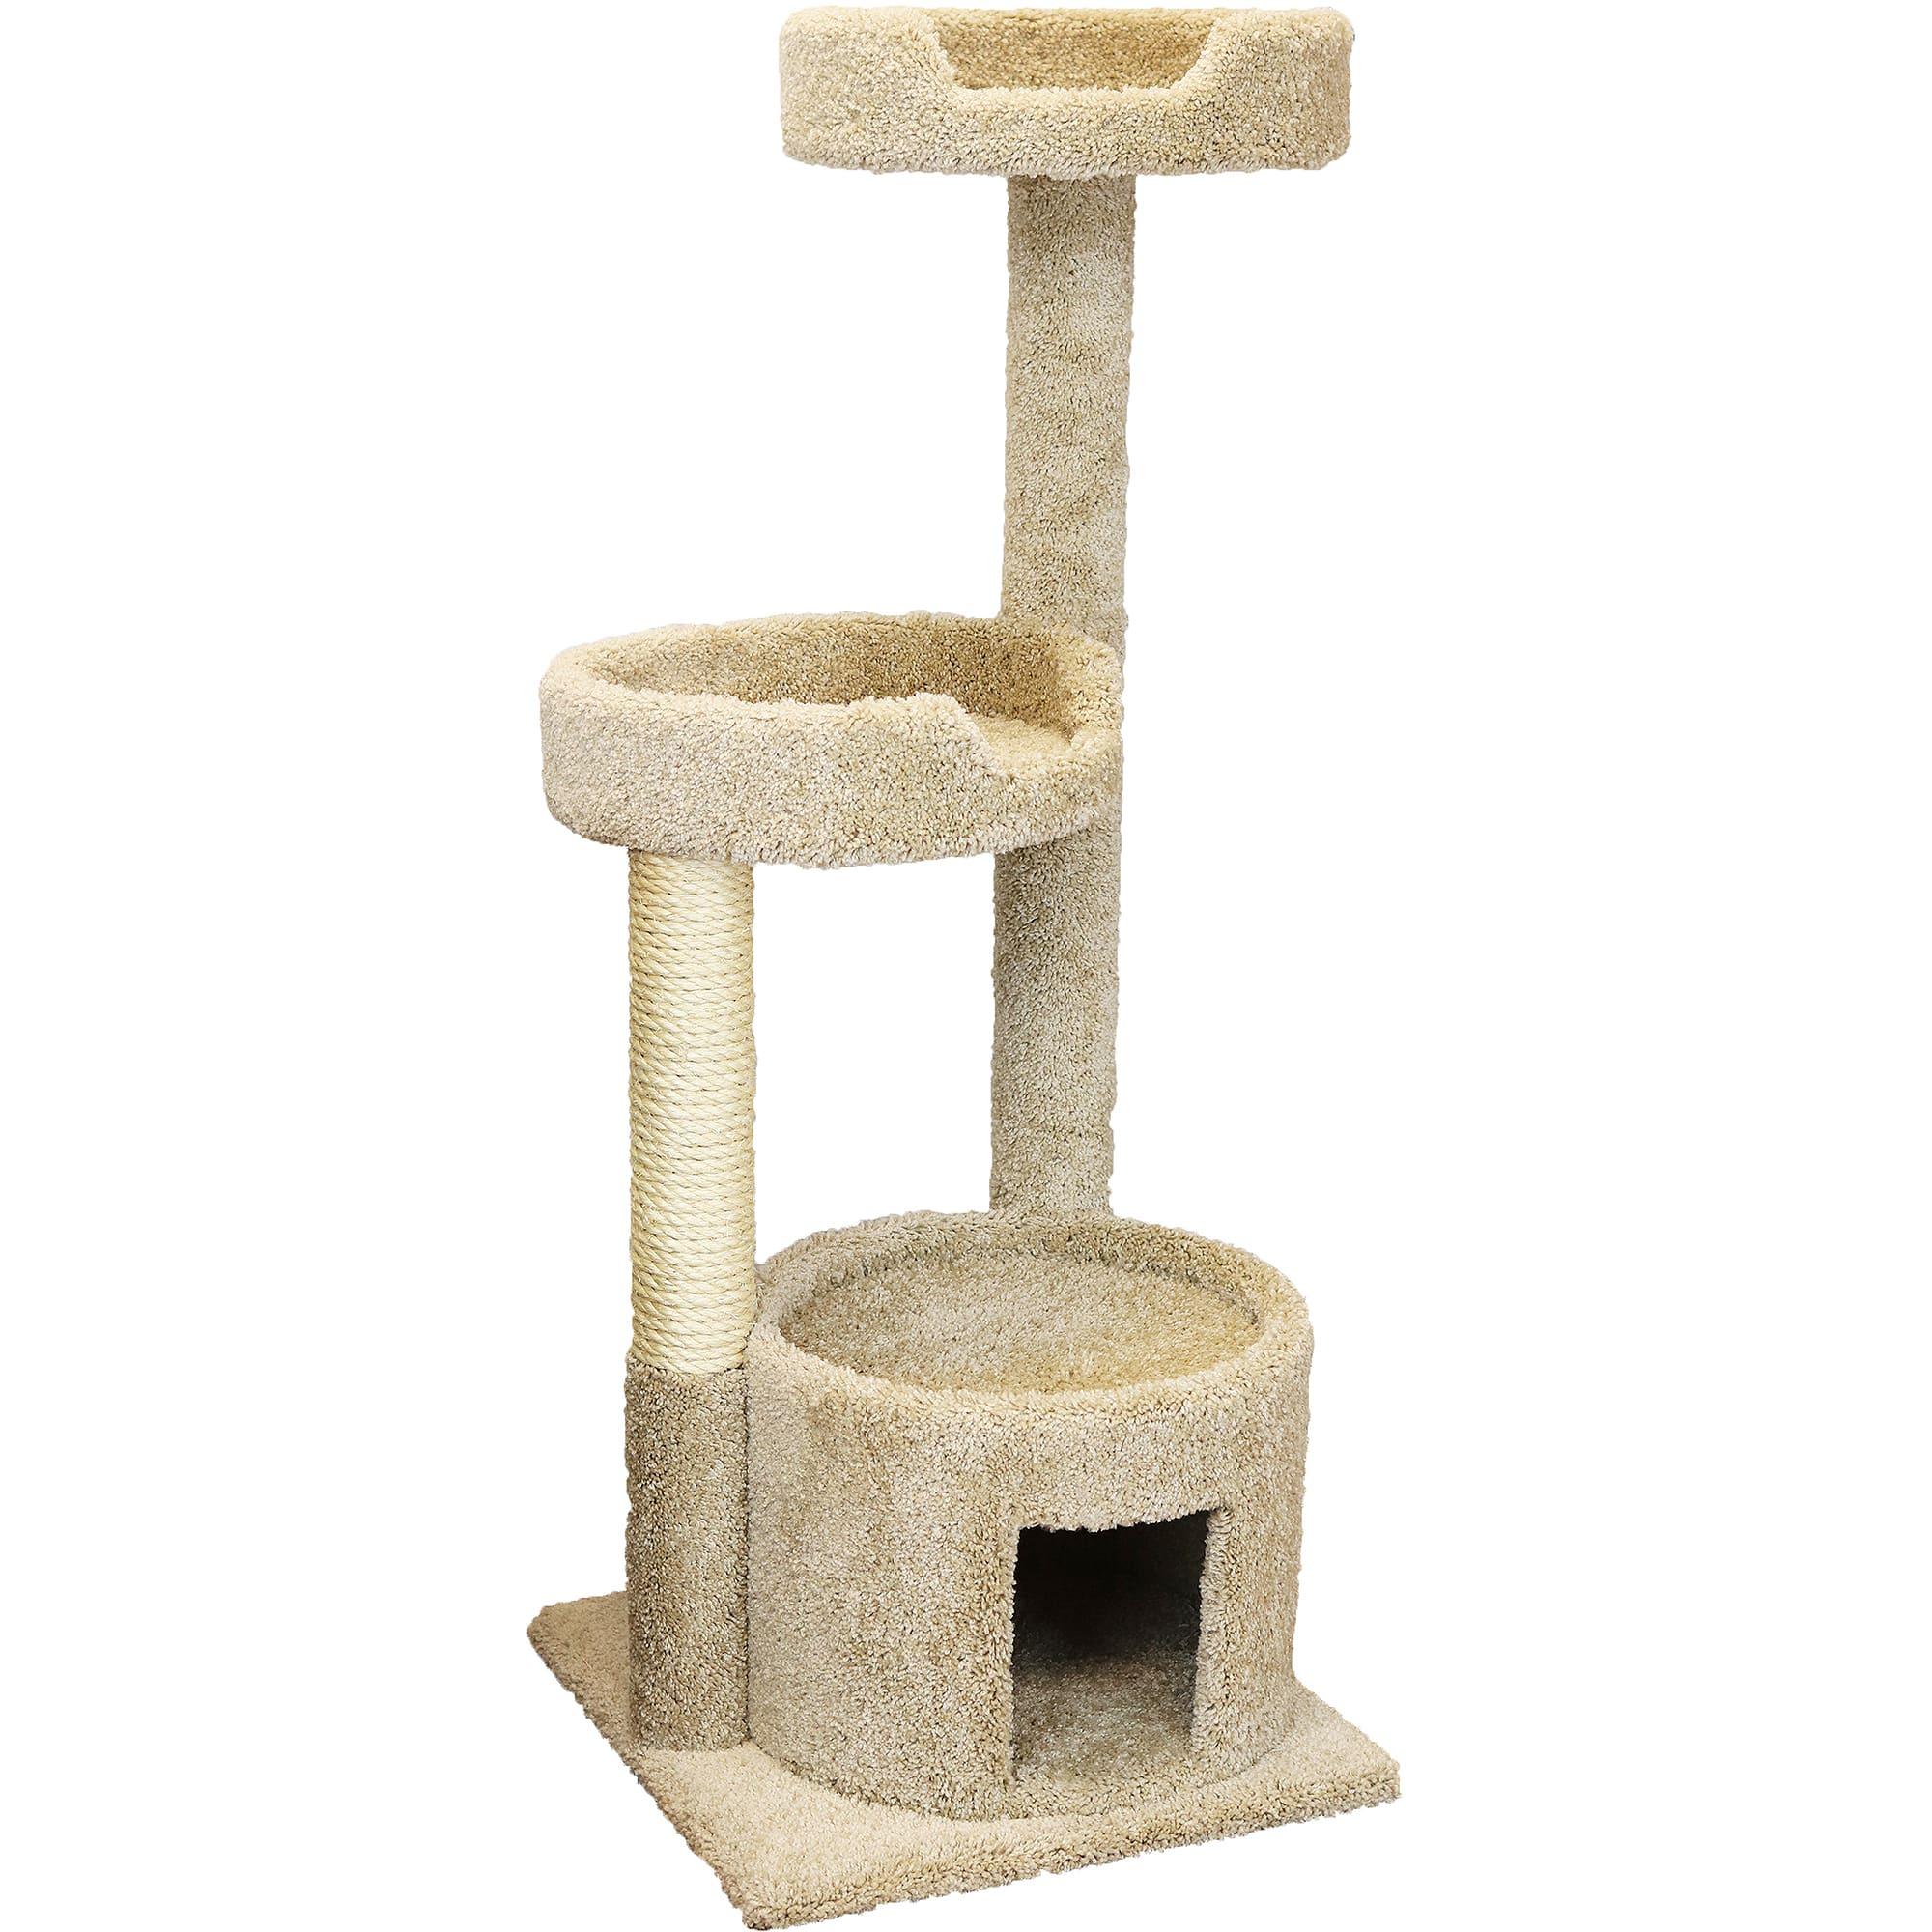 New Cat Condos 3 Level House Tan Cat Tree 50 H Petco